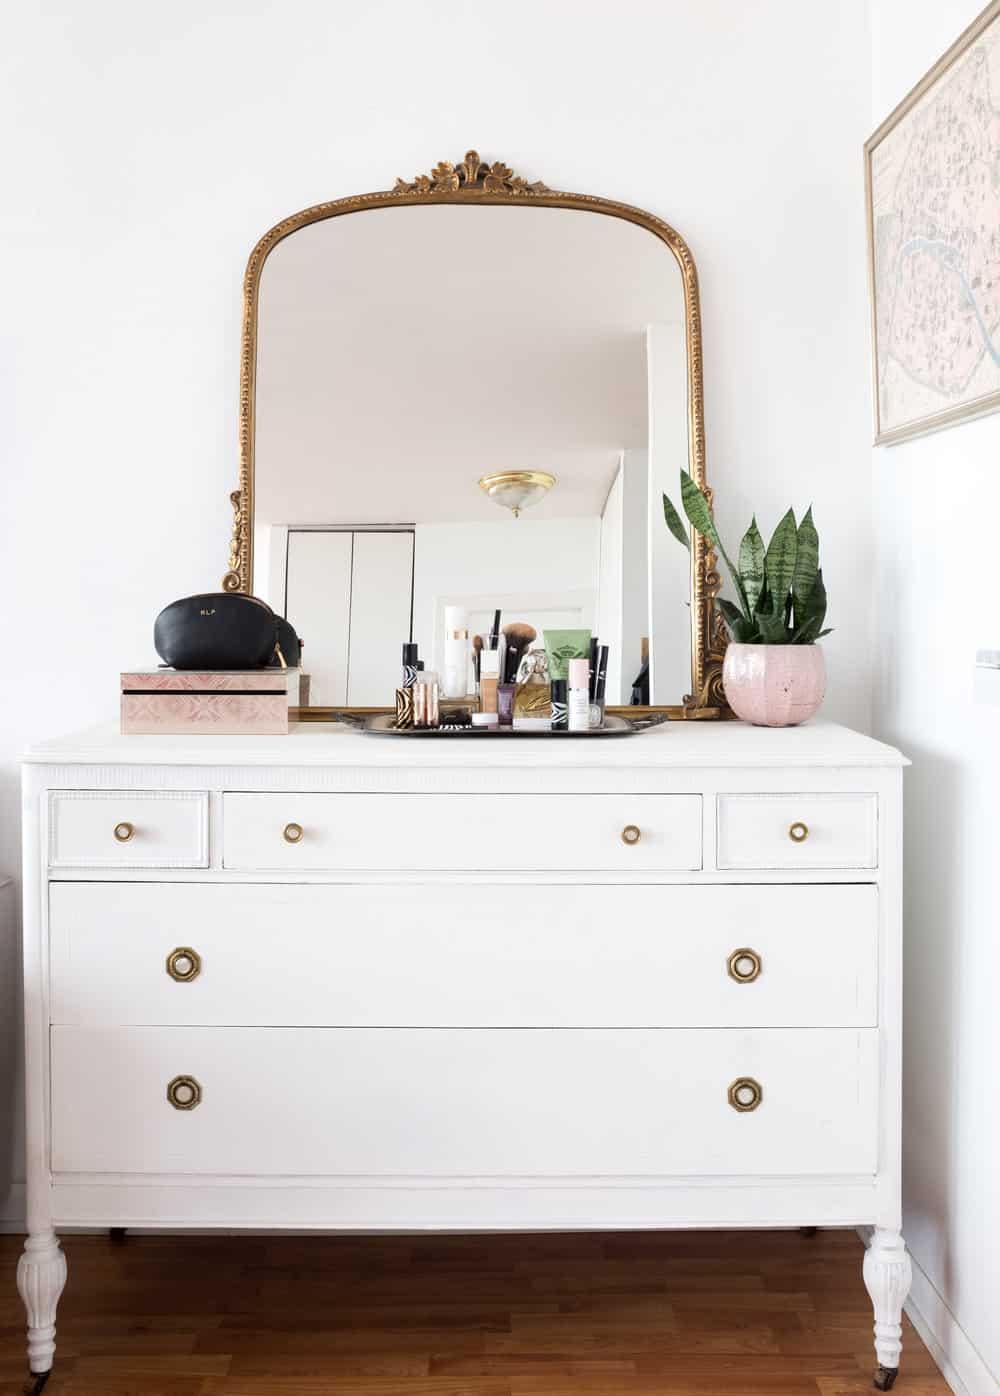 anthropologie mirror everyday parisian apartment